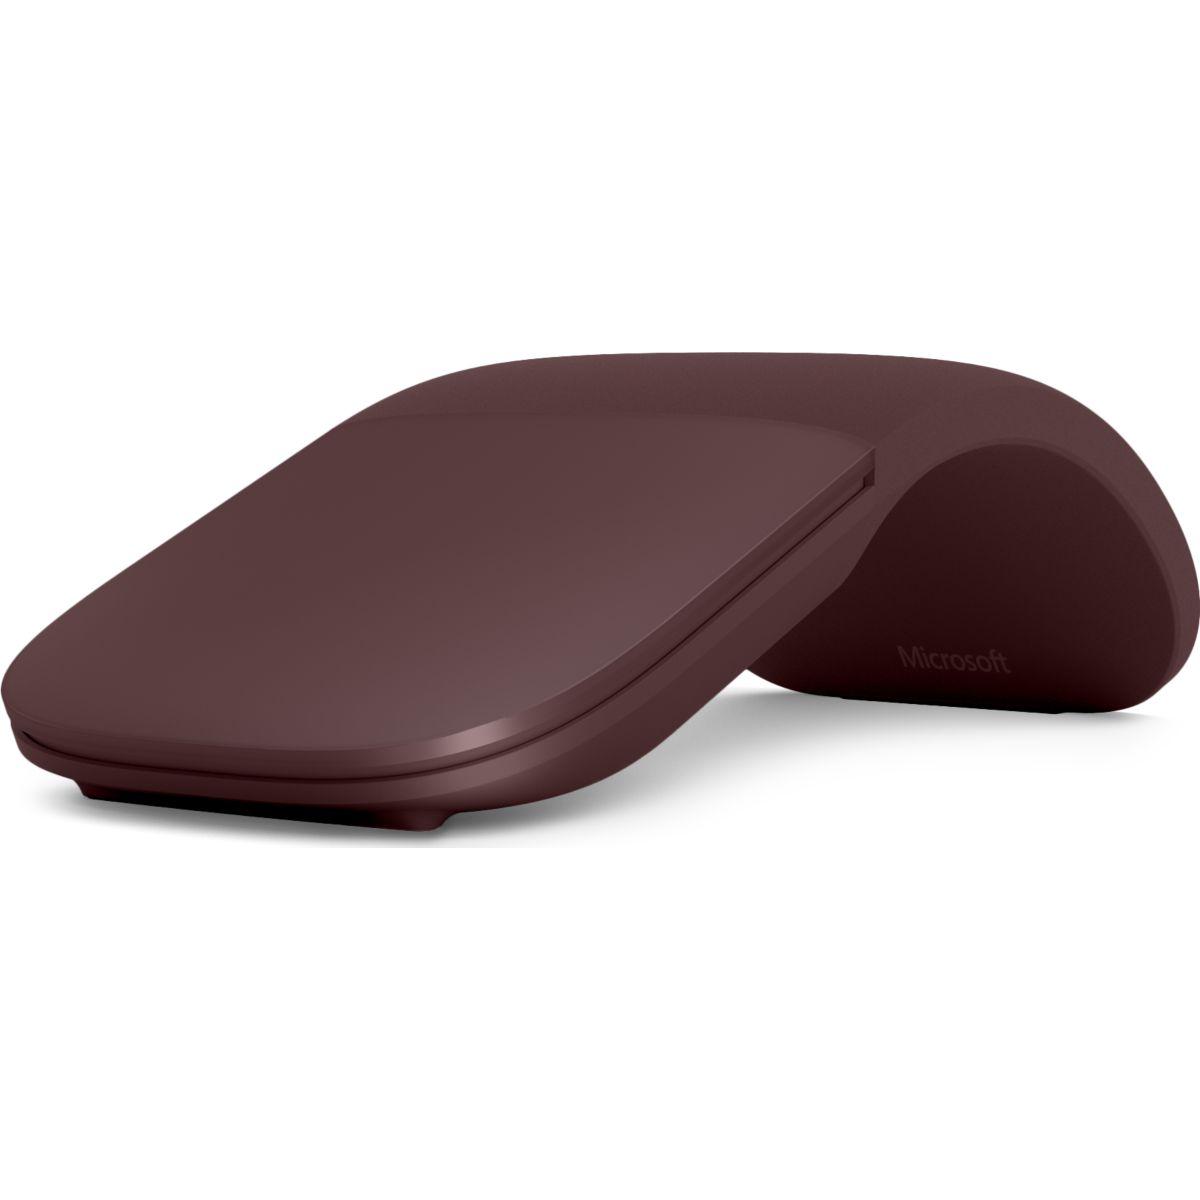 Souris MICROSOFT Arc Edition Surface Bor